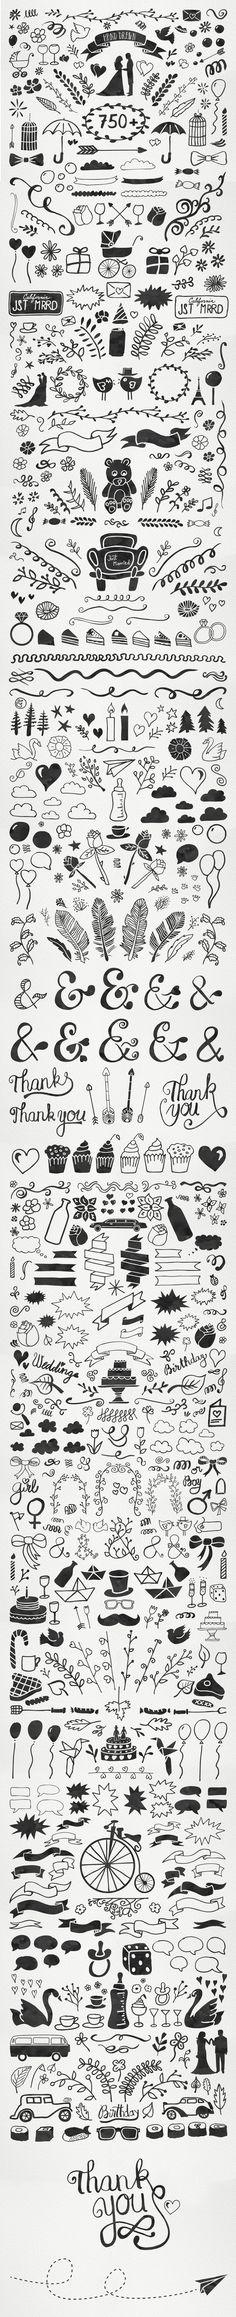 'Tis the season: Wedding & Party Watercolour Bundle